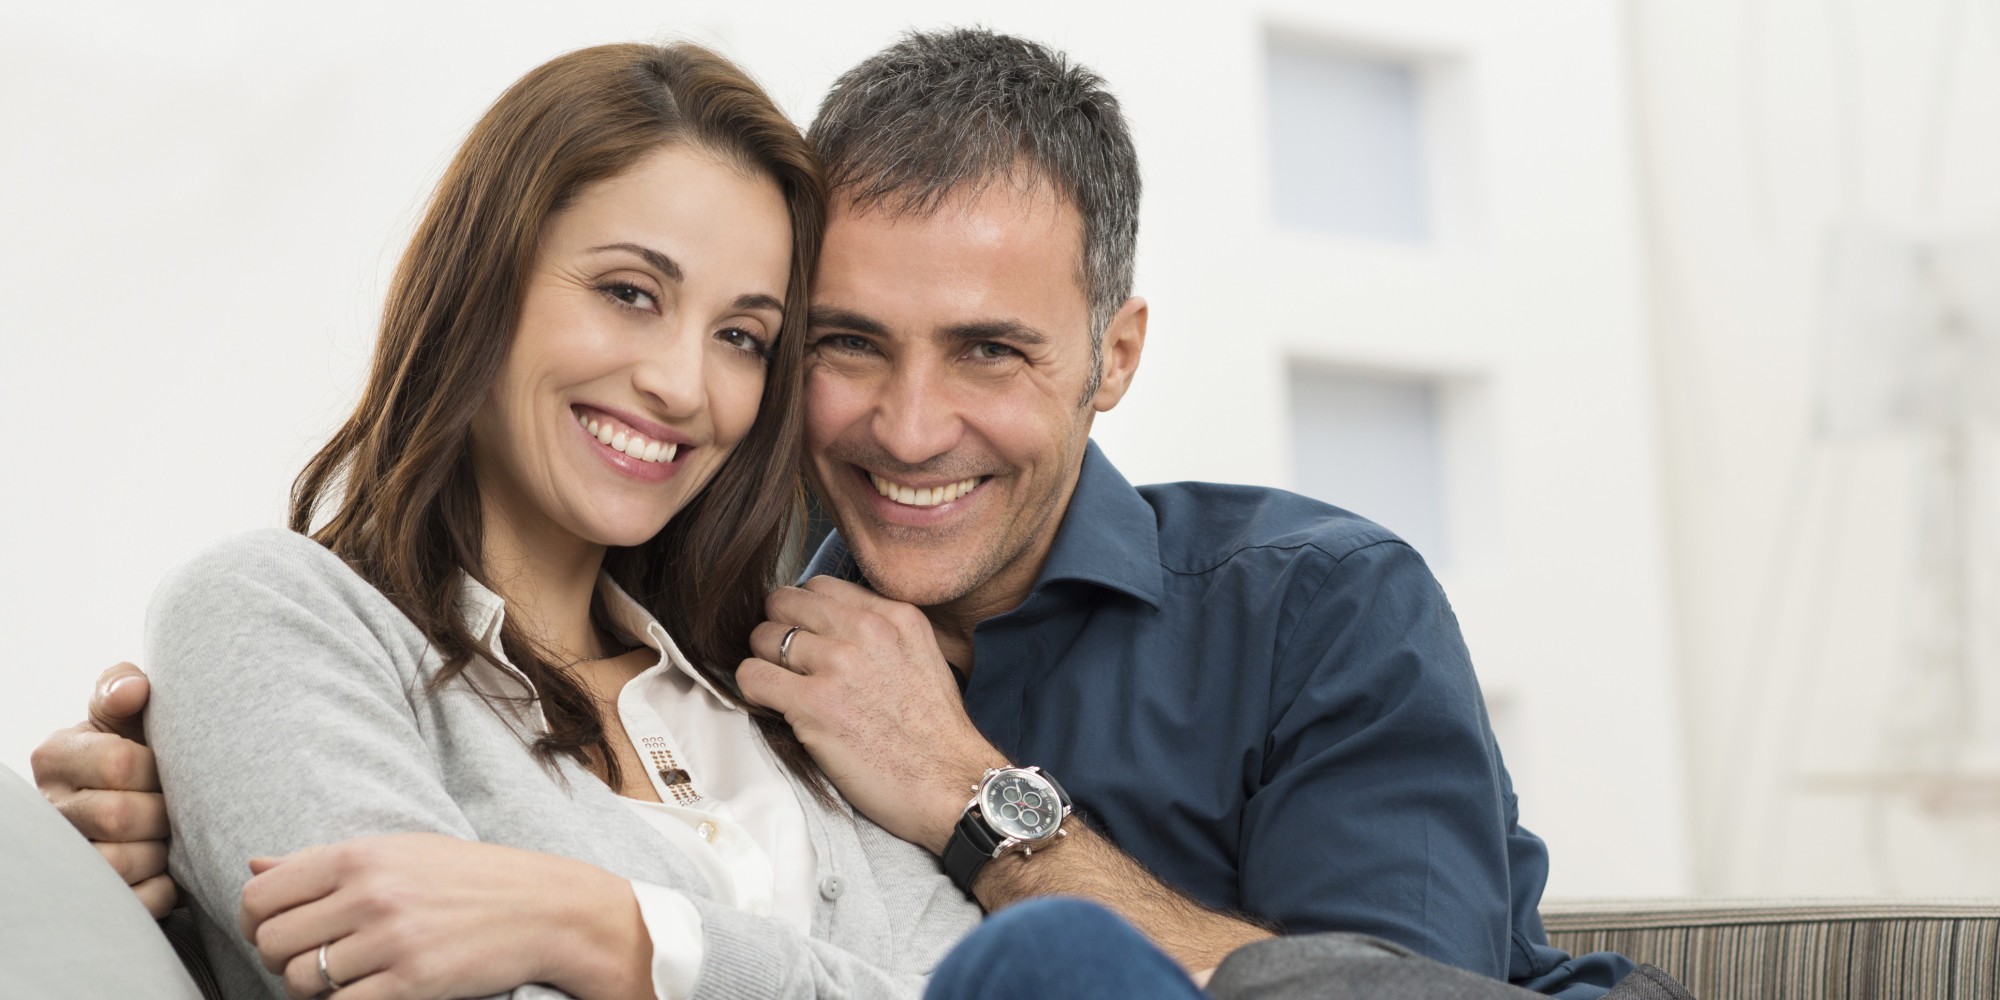 Husband and wife photo